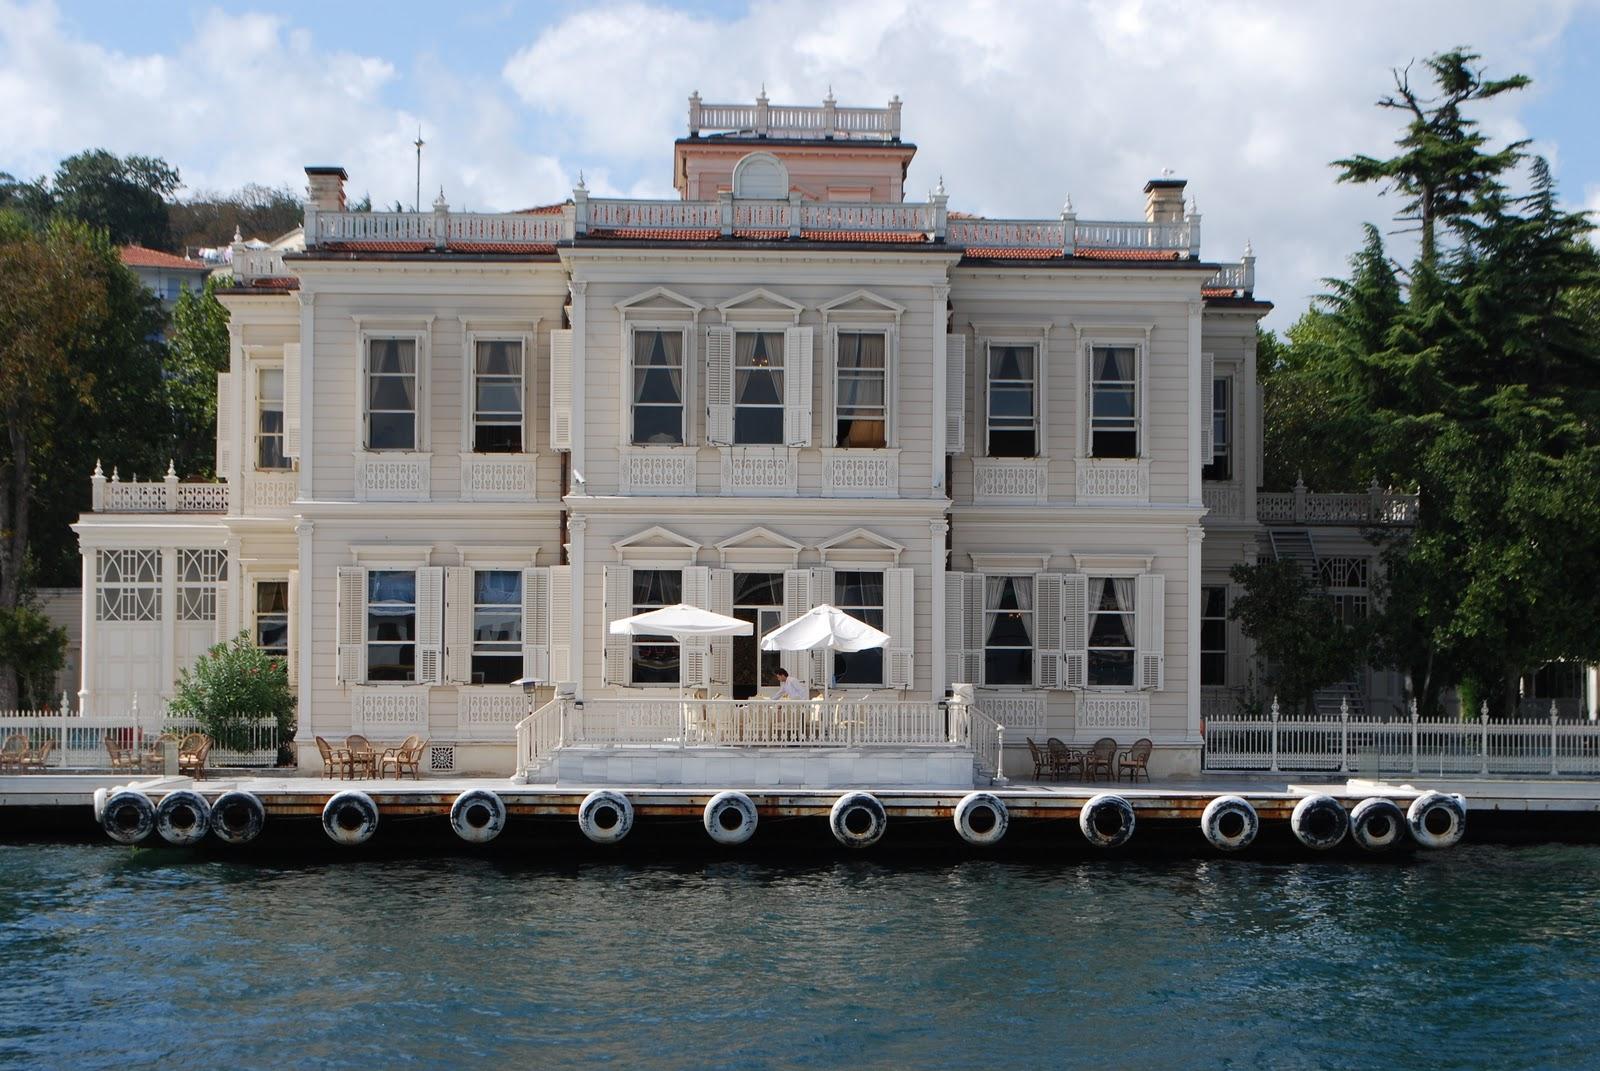 http://4.bp.blogspot.com/_pv5ccRkAhck/TKrrI36g1oI/AAAAAAAABi0/MMdpNuE9fCo/s1600/Bosphorus+Cruise+%2898%29.JPG